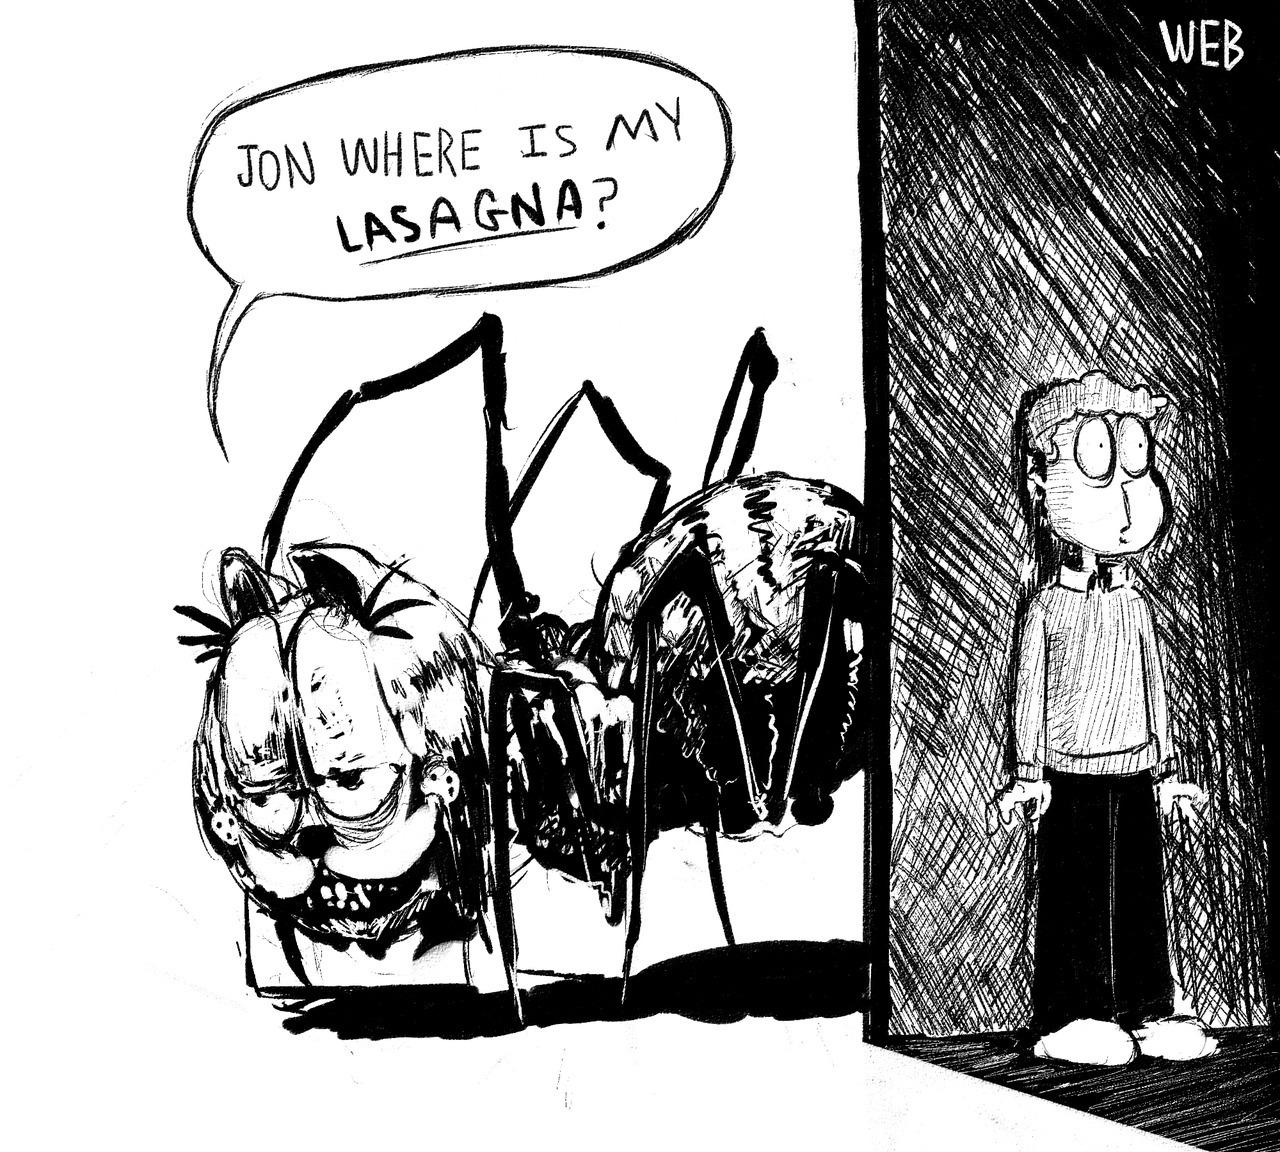 Jon Where Is My Lasagna Garfield Know Your Meme